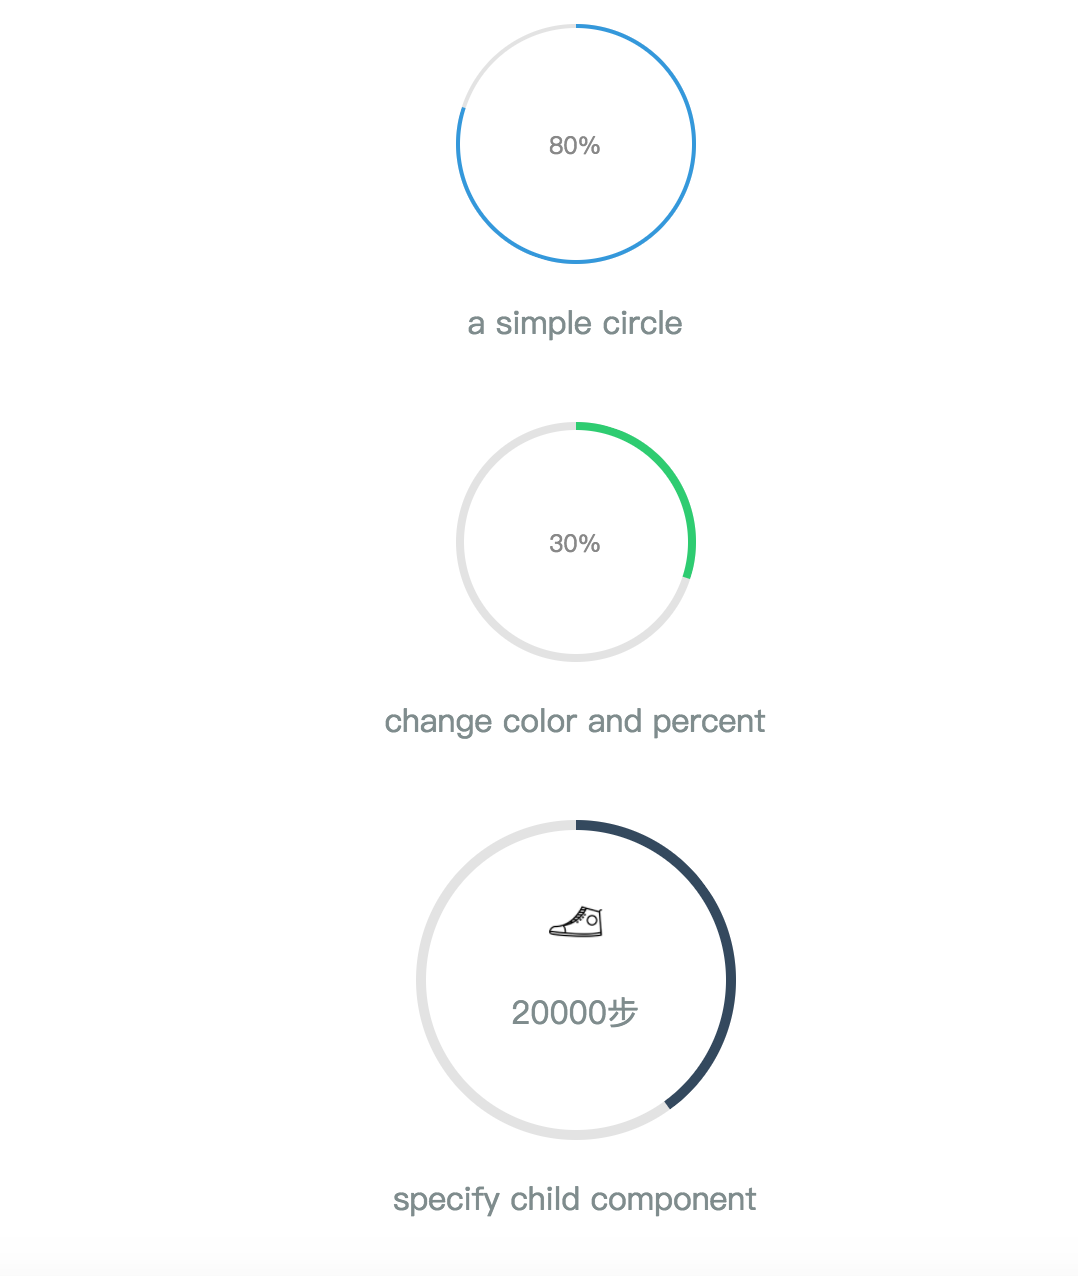 reactjs-percentage-circle